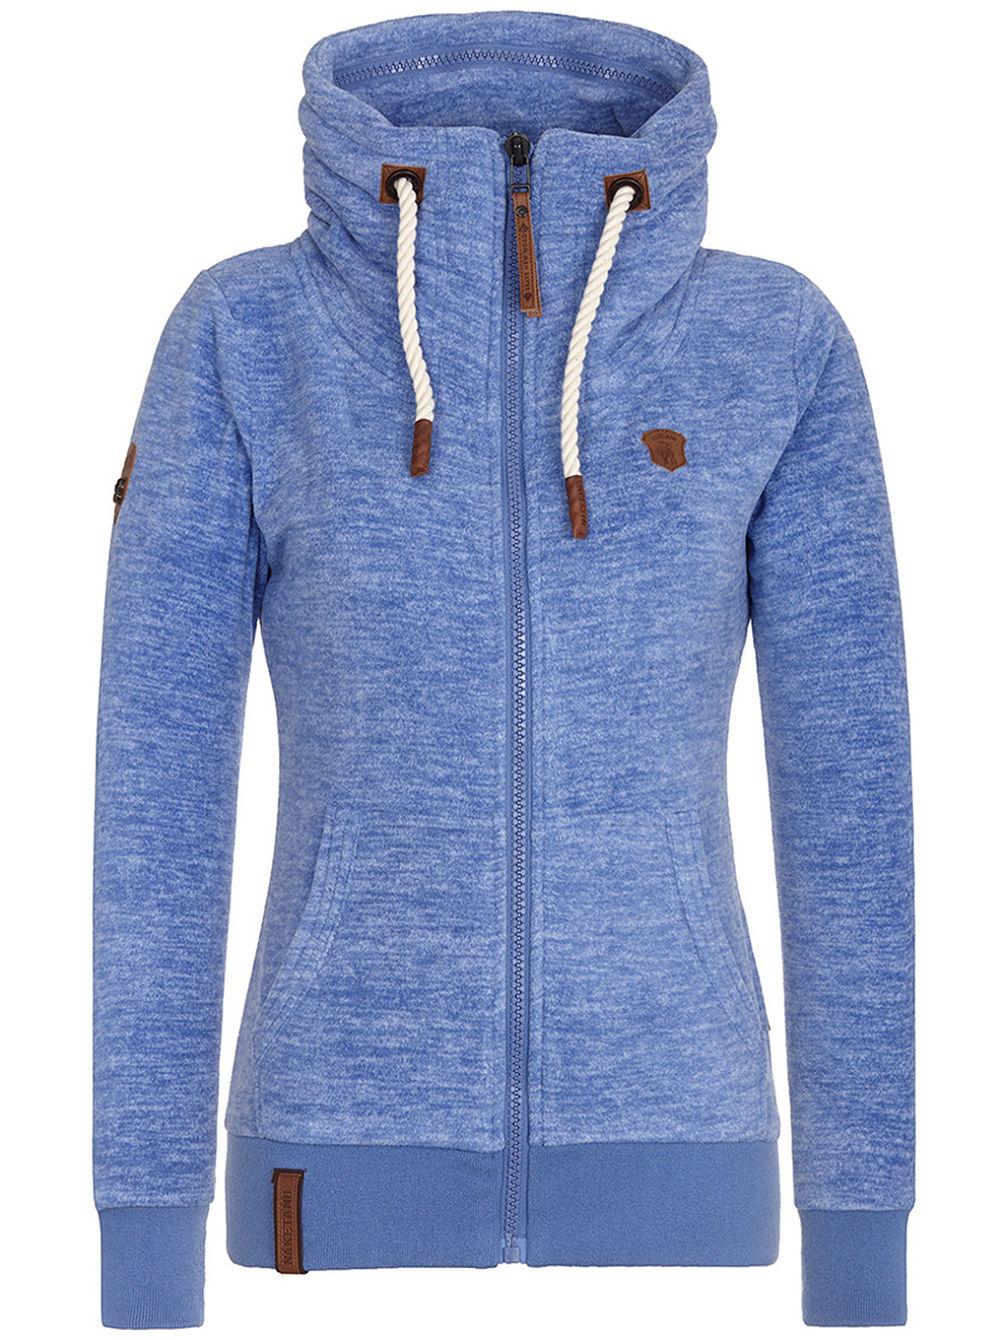 buy naketano redefreiheit ii zip hoodie online at blue. Black Bedroom Furniture Sets. Home Design Ideas